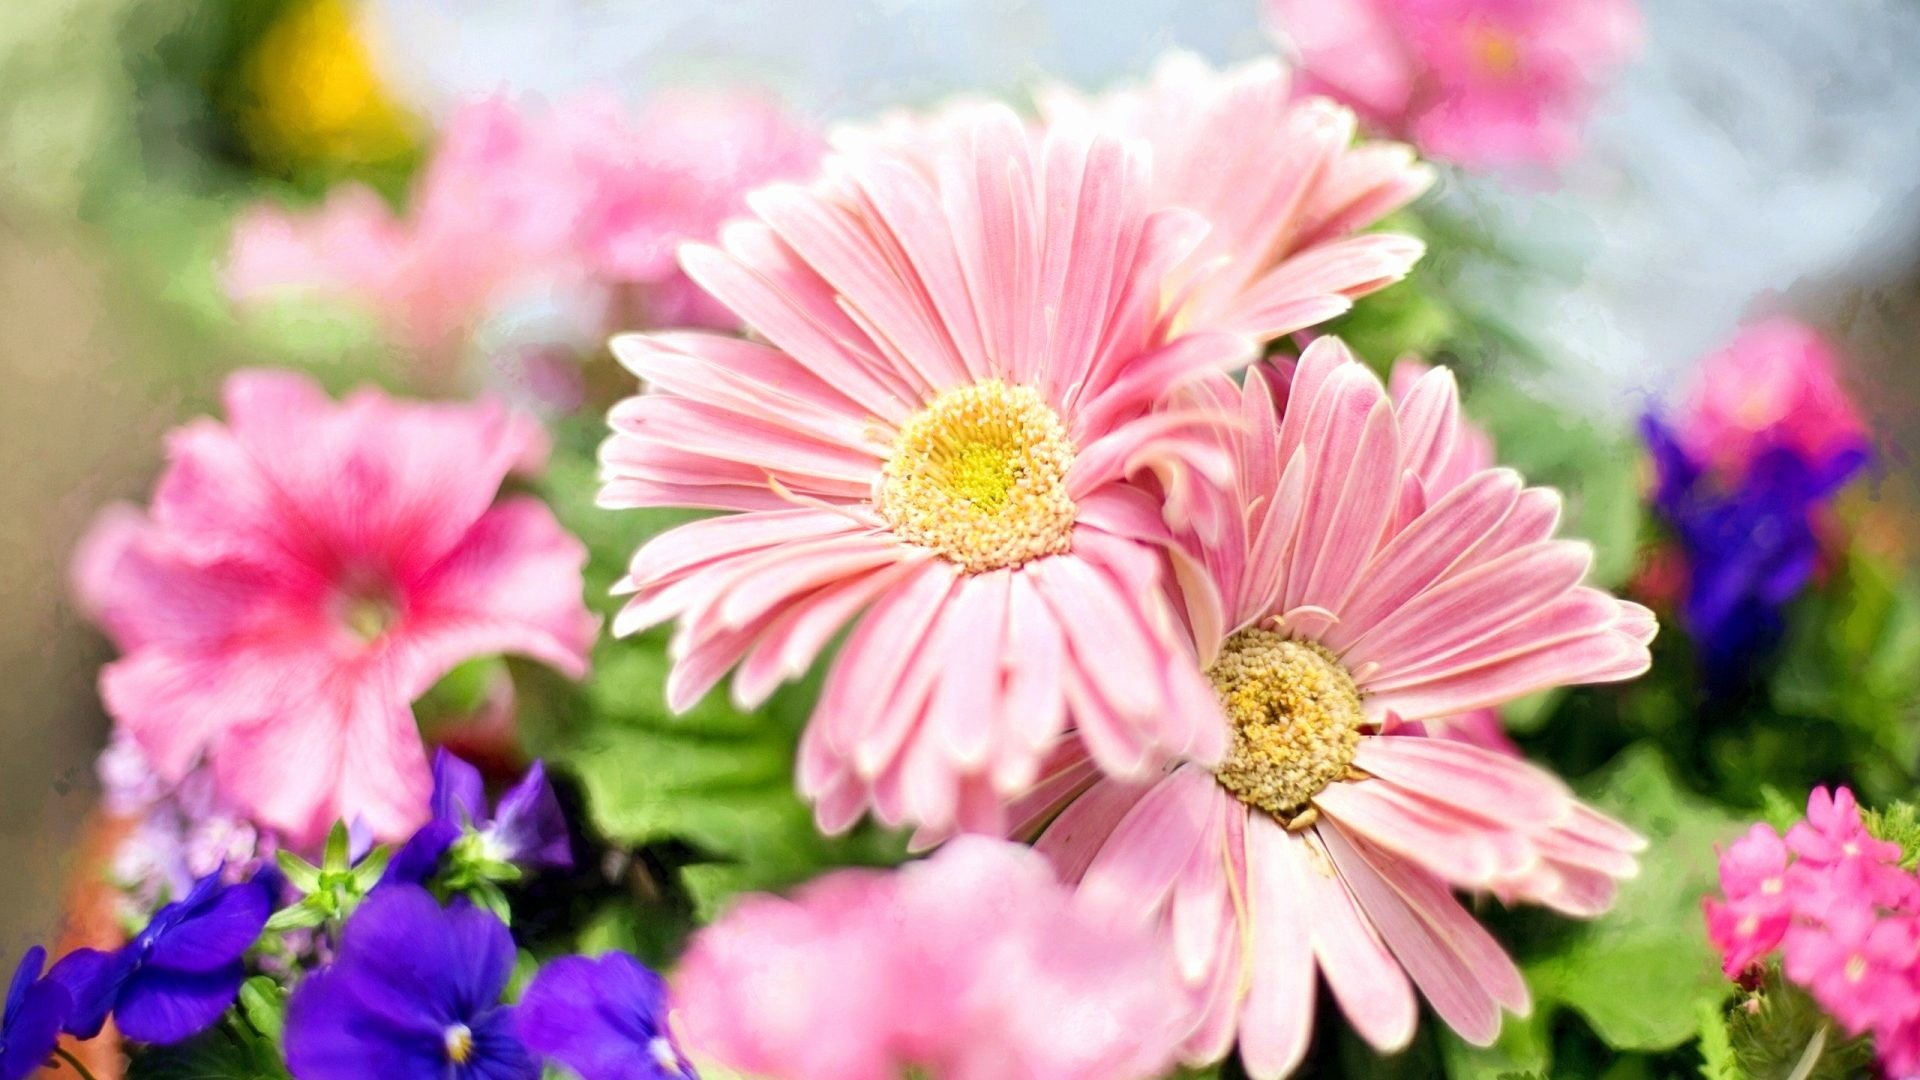 Free Flower Desktop Wallpaper Fresh Pink Flower Desktop Wallpaper ·① Wallpapertag